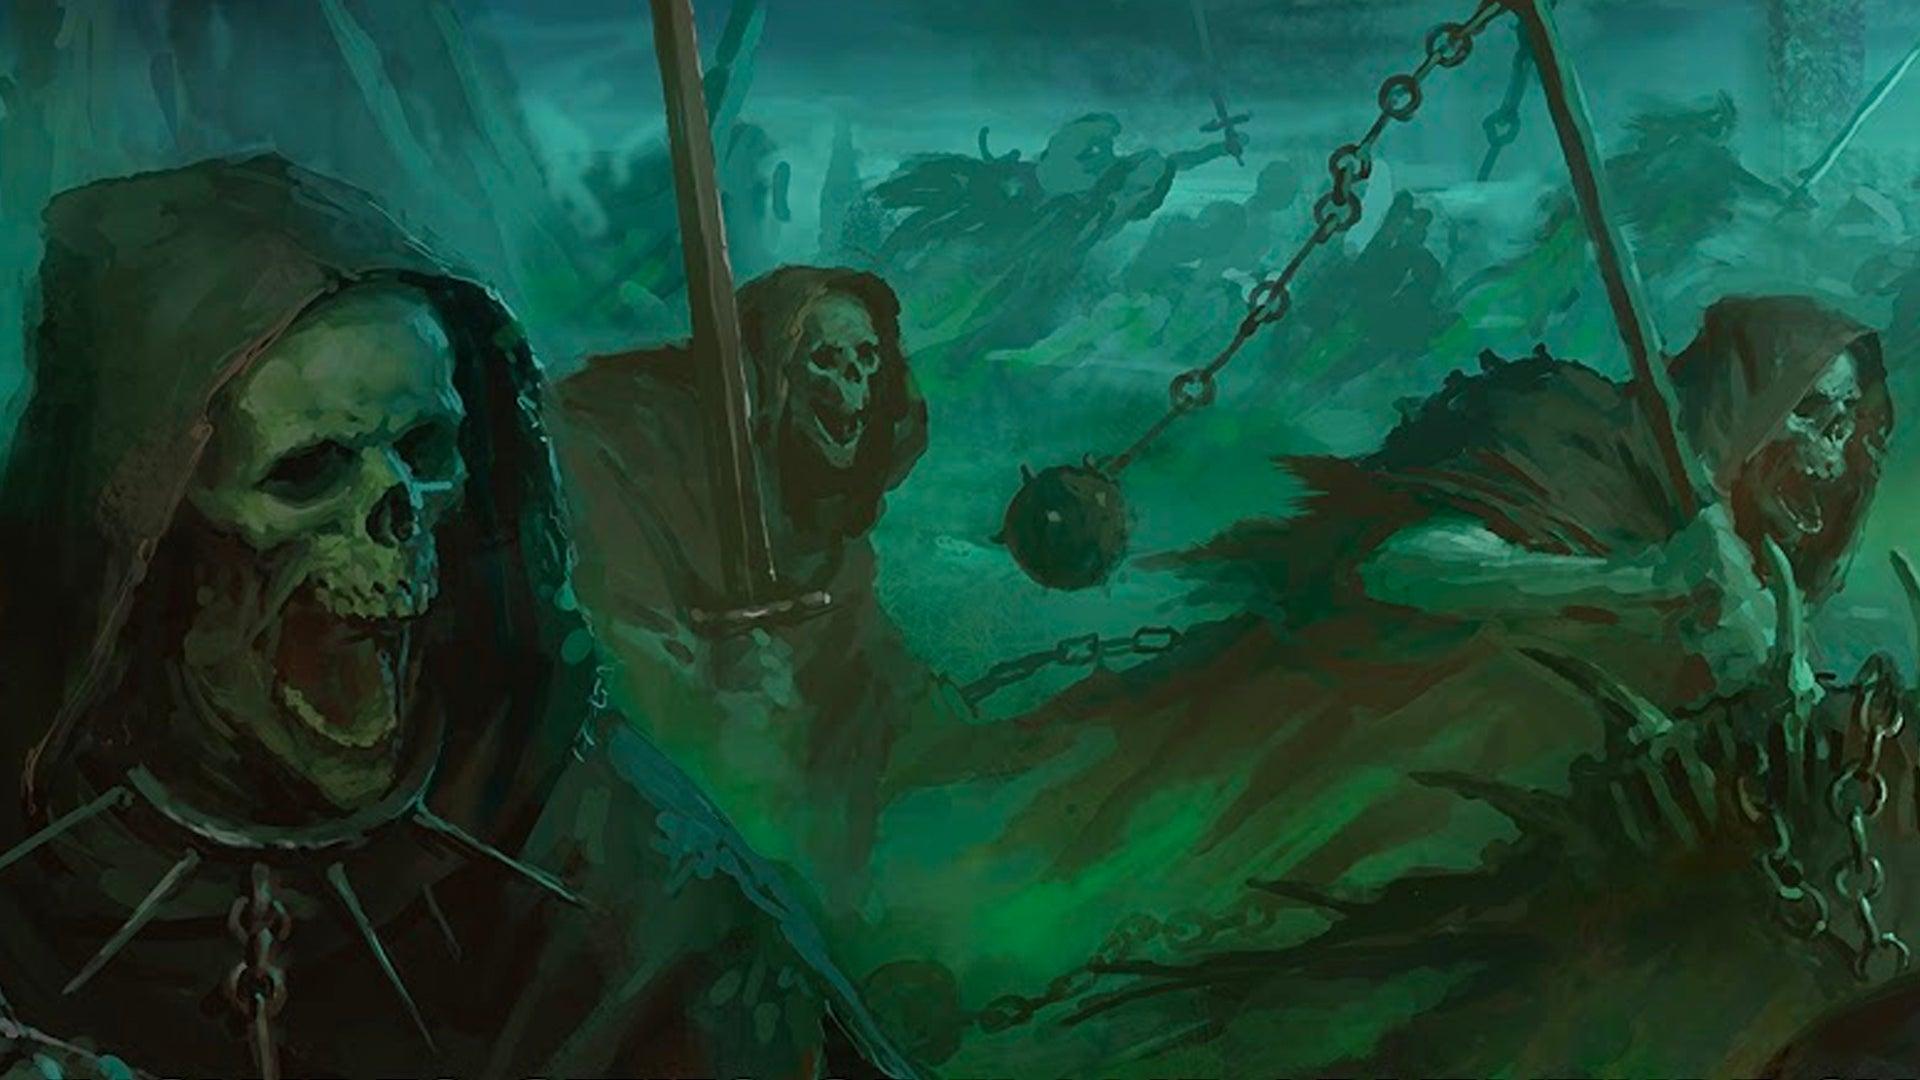 warhammer-age-of-sigmar-soulbound-rpg-gm-screen-artwork.jpg